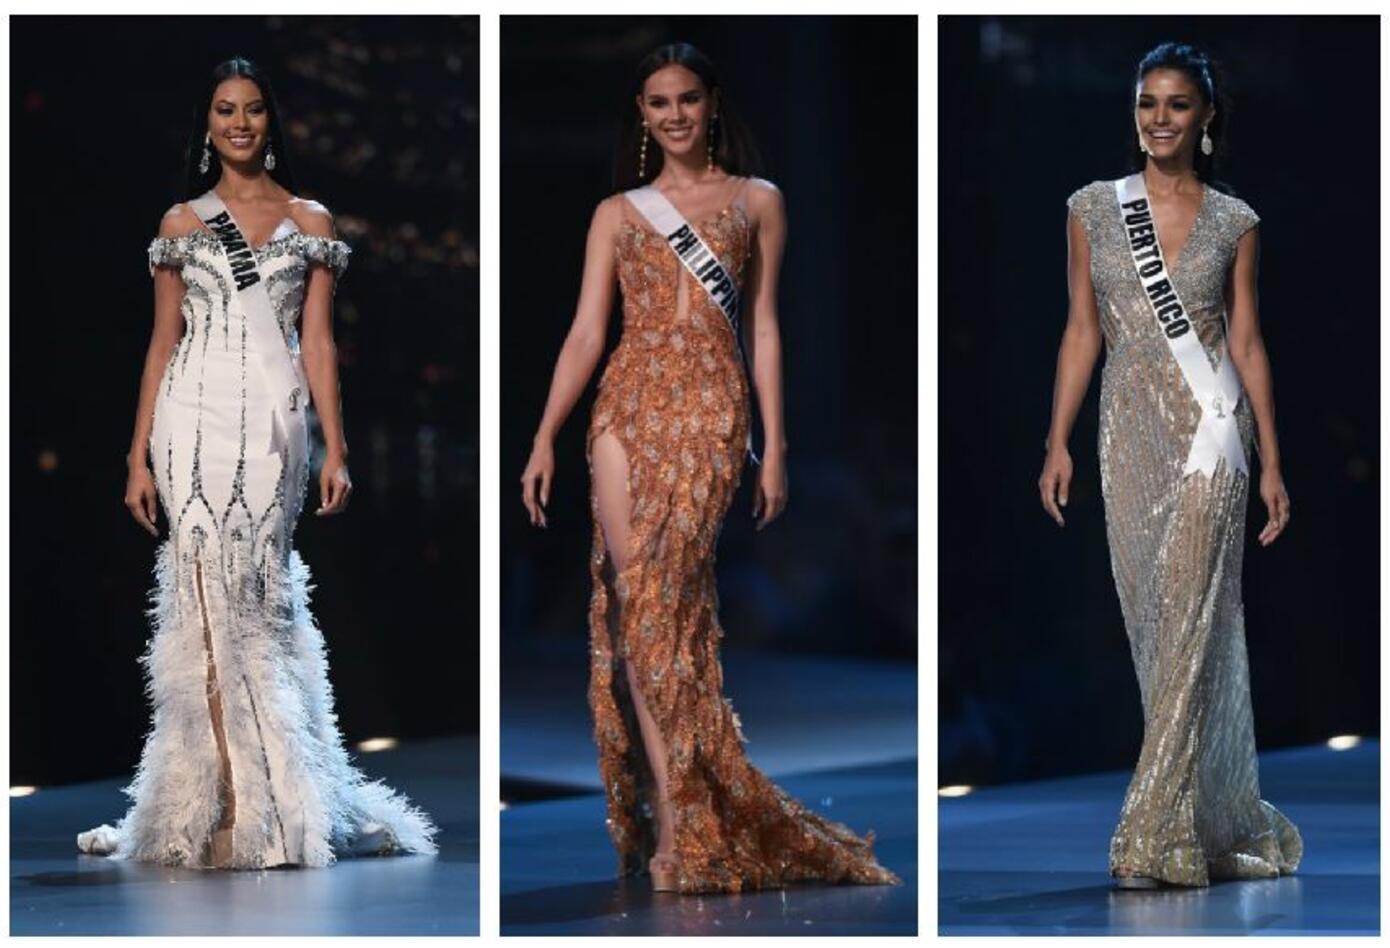 Miss Panamá, Miss Filipinas y Miss Puerto Rico en Miss Universo 2018